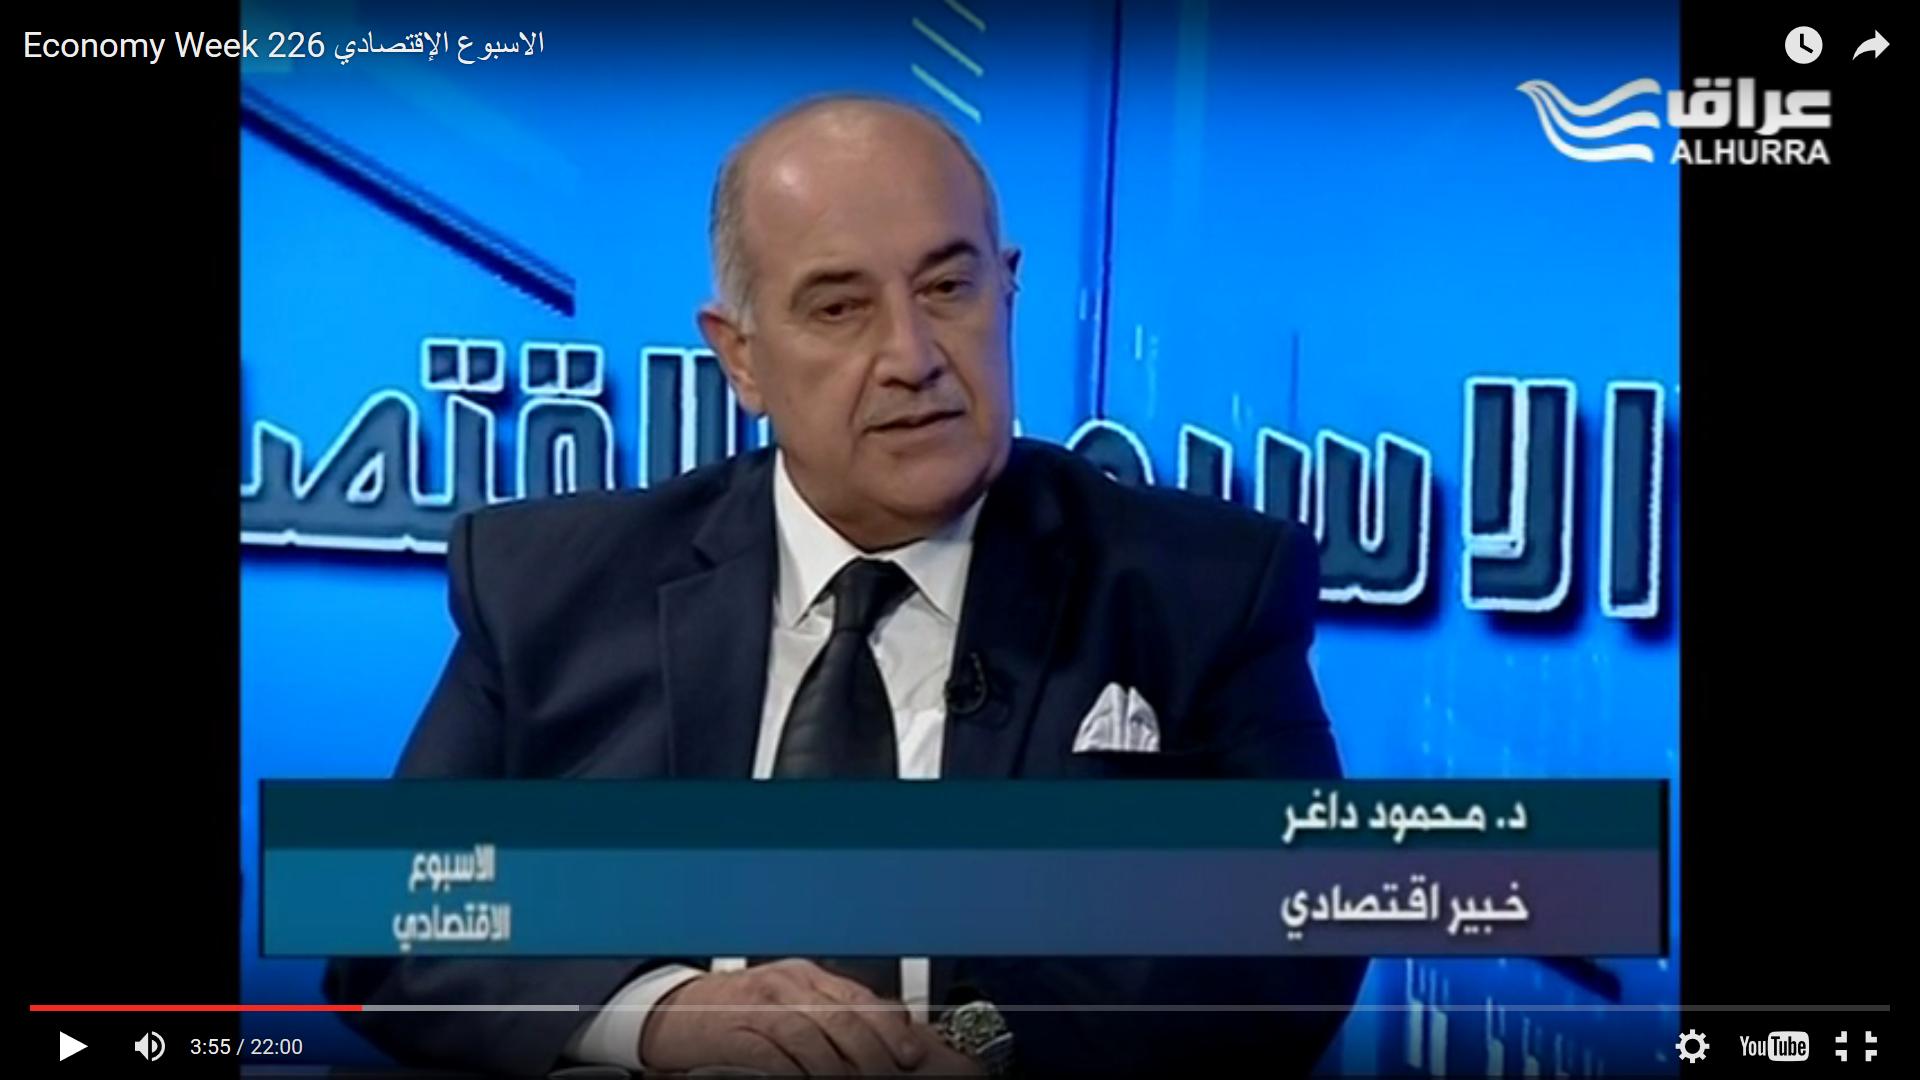 Prof.Dr. Mahmoud Mohammed Mahmoud Dagher: Lights on the devaluation of the Iraqi dinar Mahmoud-Al-Daghir-image-Economy-Alhurra-1